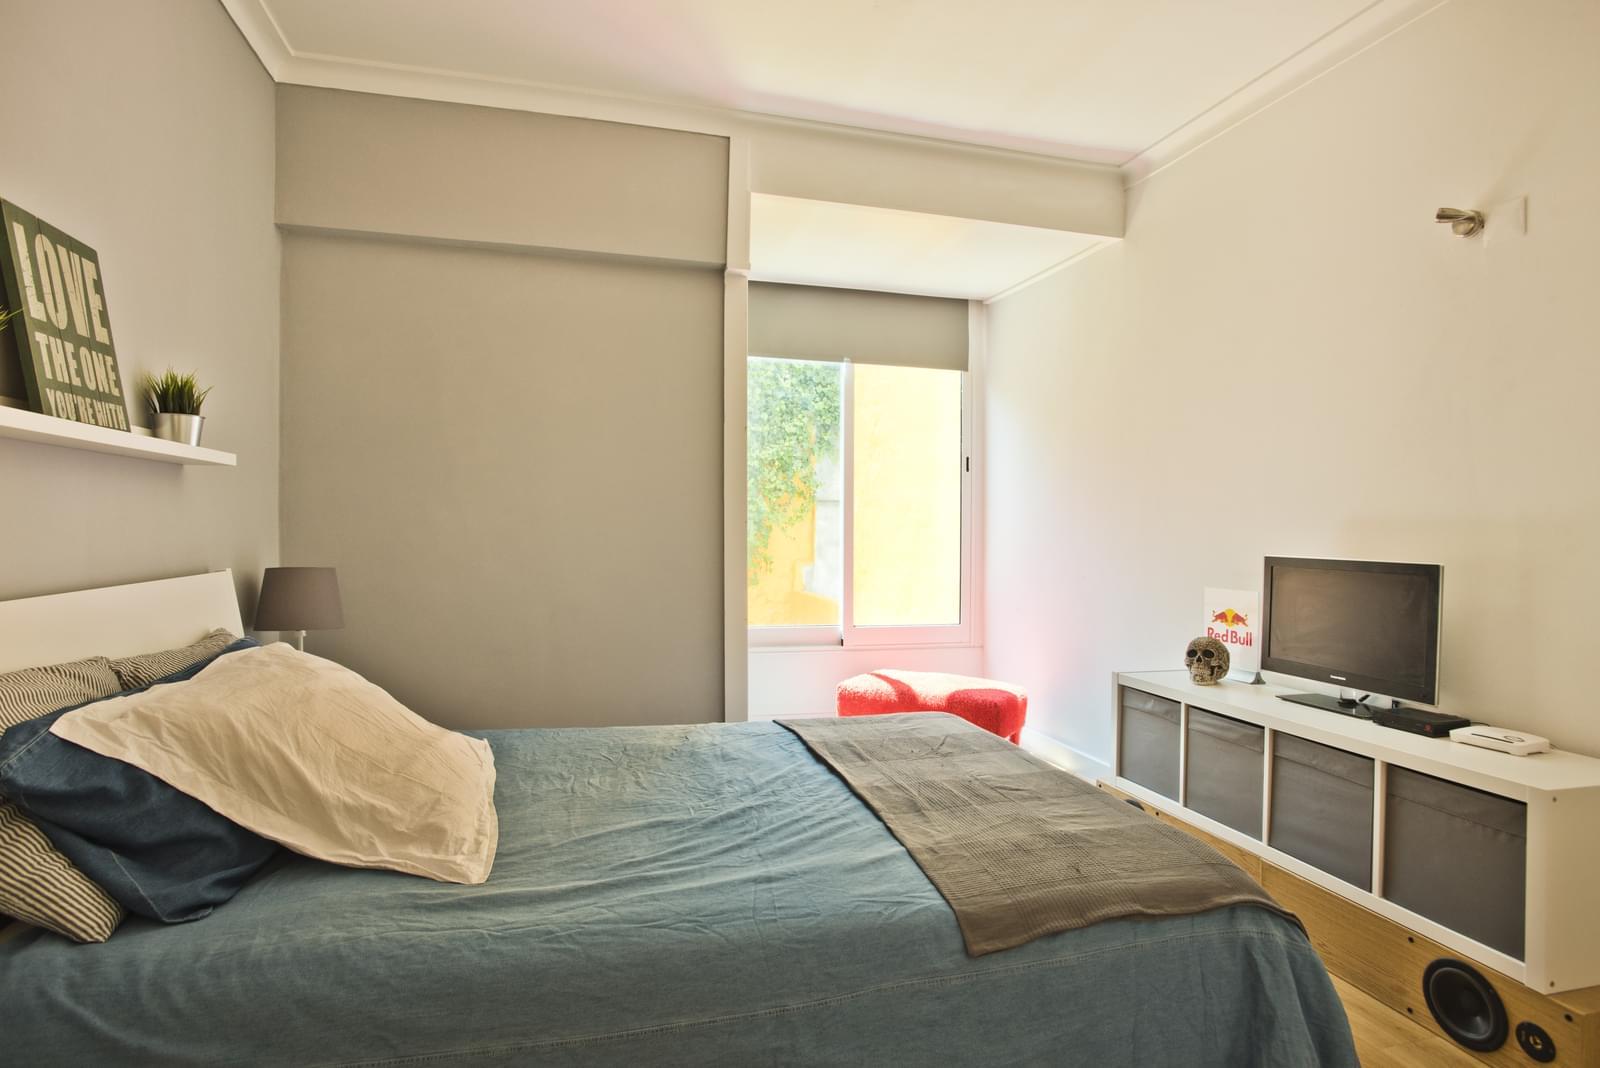 pf17010-apartamento-t4-cascais-778698f9-5c9d-40cd-8904-f99c6bb69a03